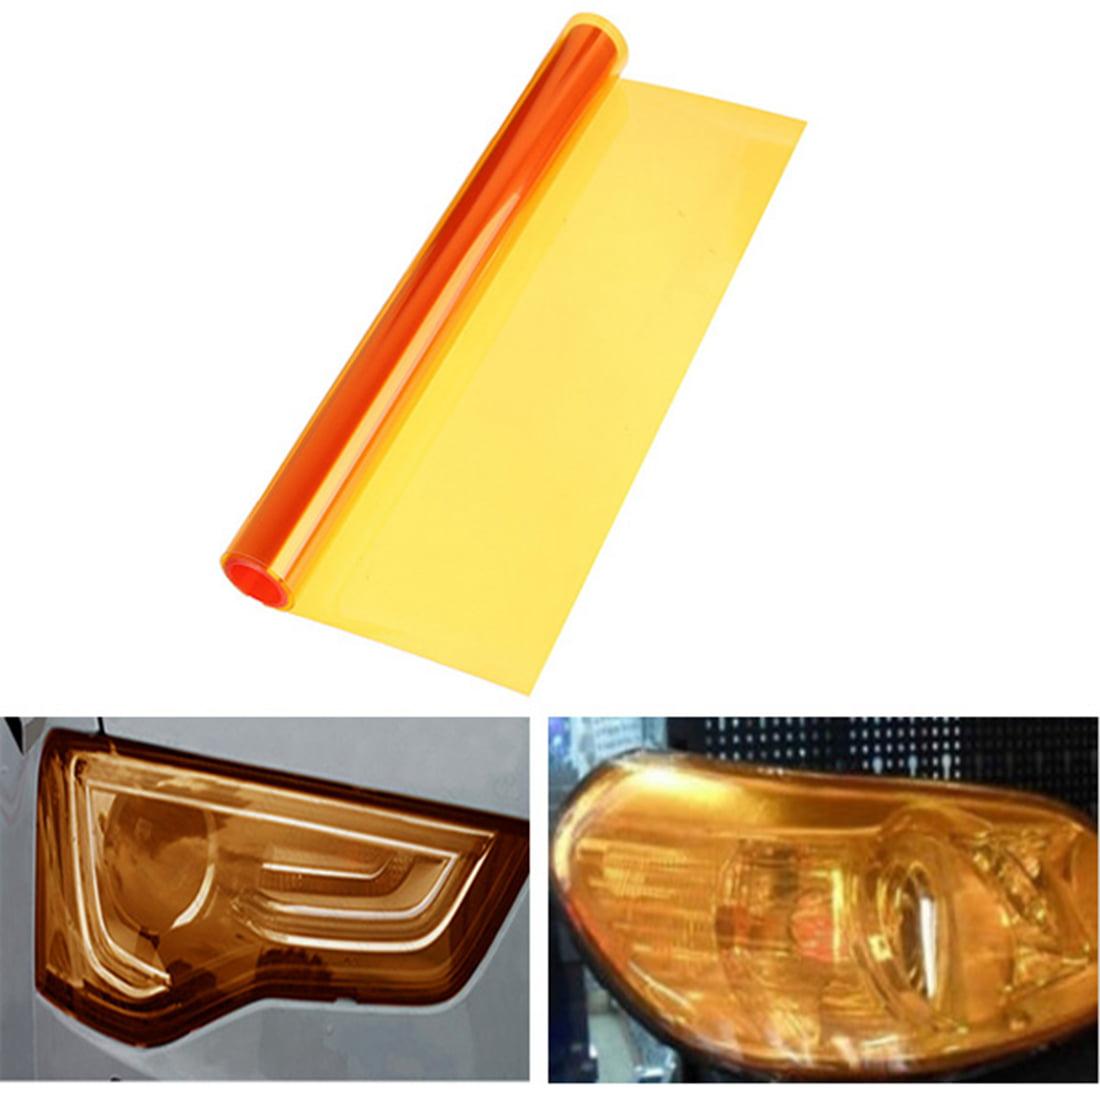 "Car Headlight Taillight Fog Light 12""x48"" 7 Color Tint Head Lamp Vinyl Sticker Film Sheet Decal Decor Cover Universal Vehicle Auto Truck SUV Van MATCC  US"